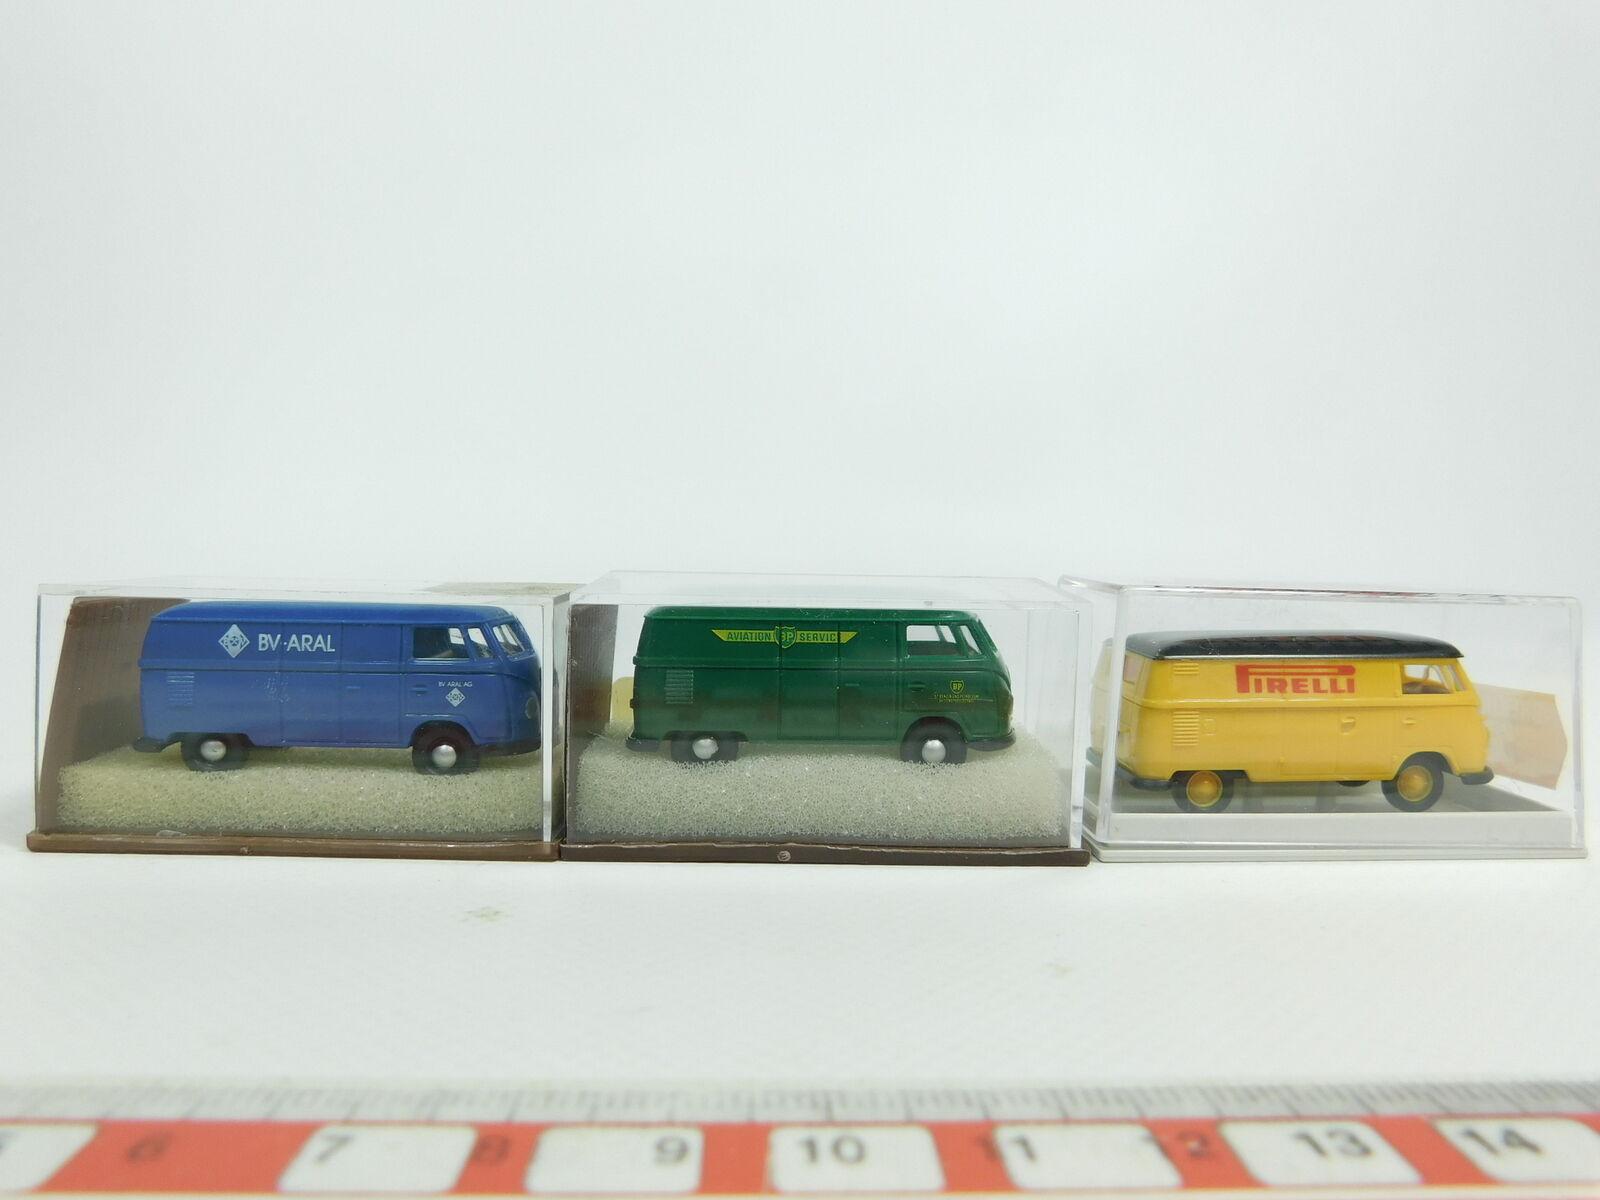 Bd384-0, 5  3x Brekina h0 1 87 volkswagen t1 t1 t1  3201 bp aral +32525 pirelli Neuw + embalaje original 200bda